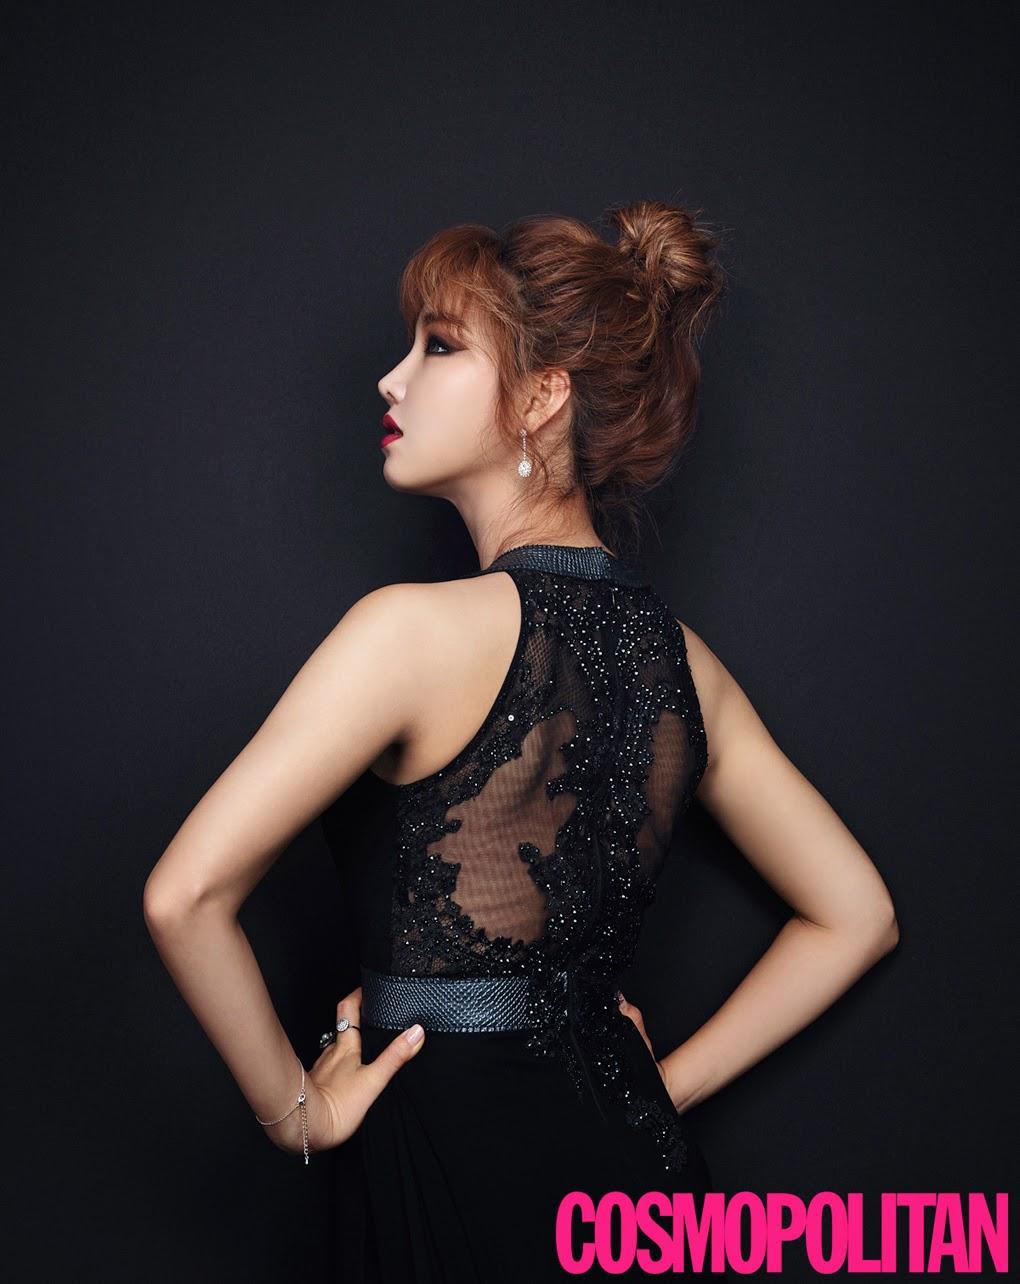 Lee Yoo Ri - Cosmopolitan Magazine December Issue 2014